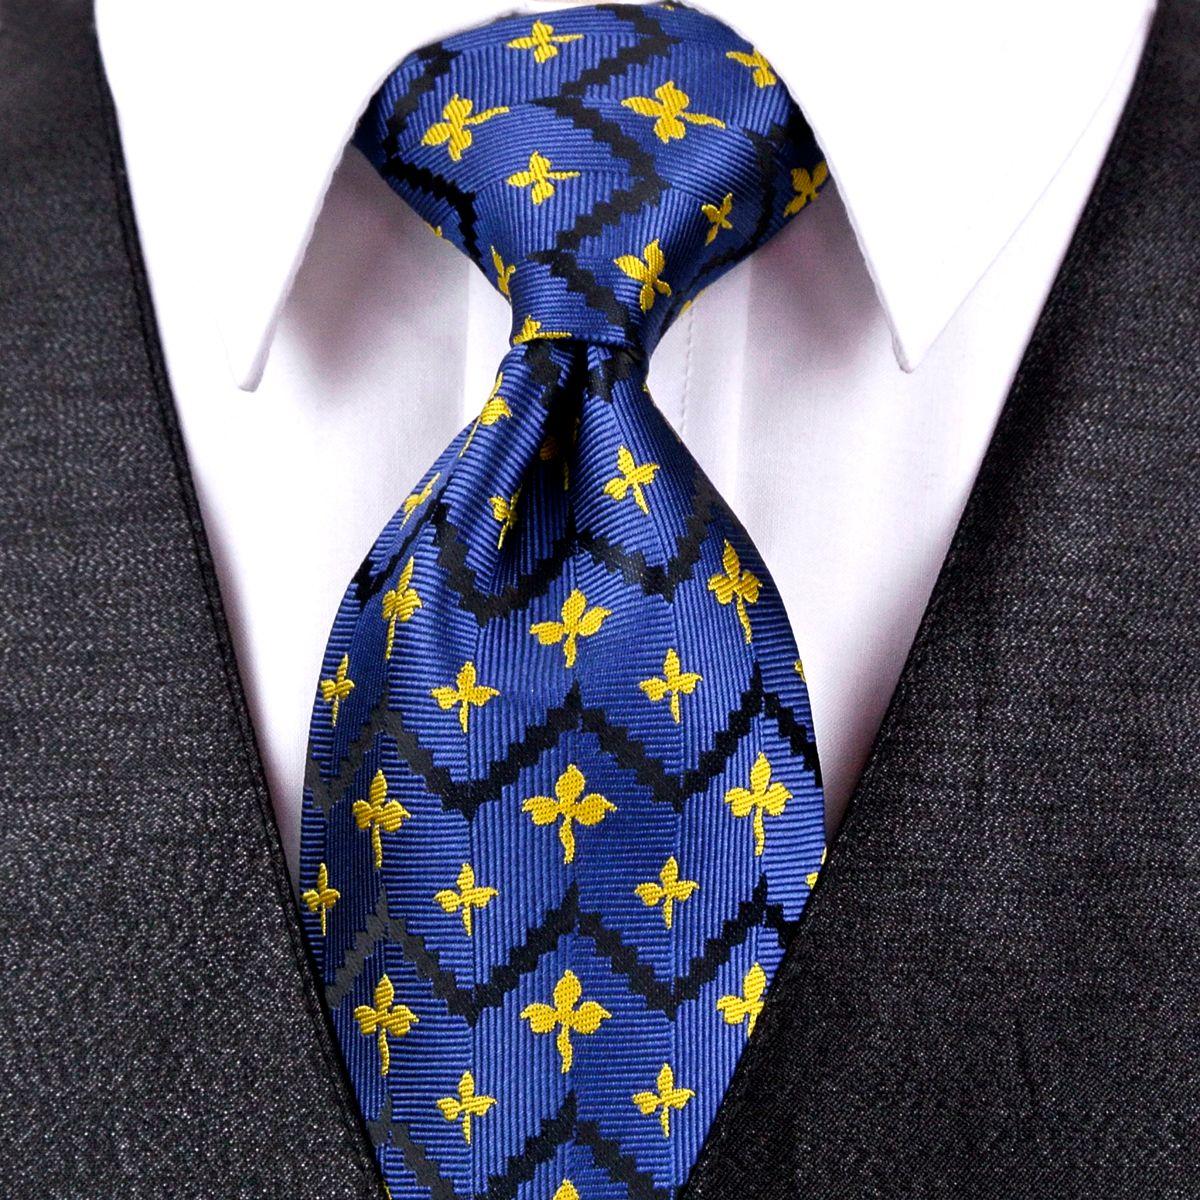 7a2510fdd4db J26 Navy Blue Yellow Geometric Mens Ties Neckties Handkerchief 100% Silk  Jacquard Woven Tie Set Elegant Wholesale Canada 2019 From Navyblue, ...